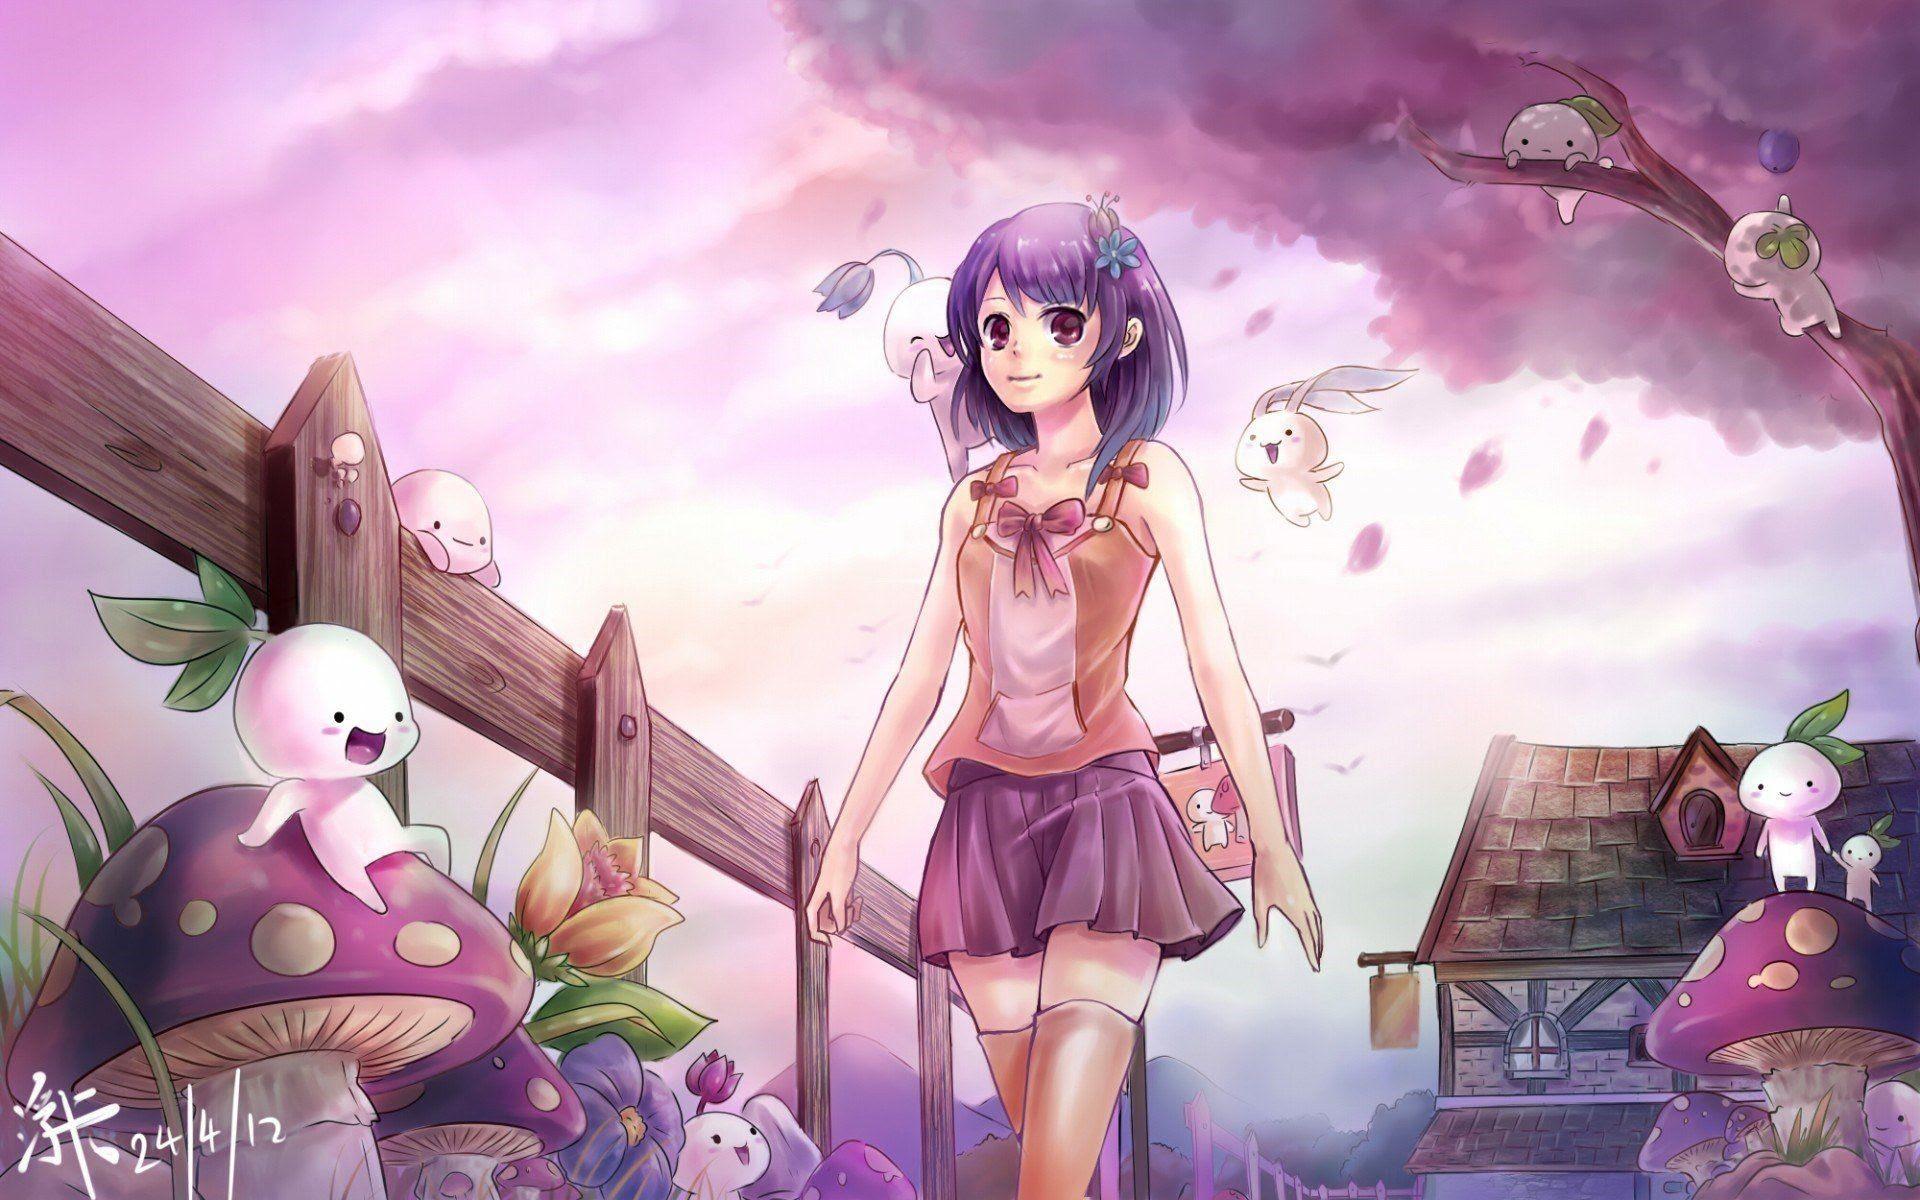 Download 300 Wallpaper Anime Hd Laptop HD Gratis